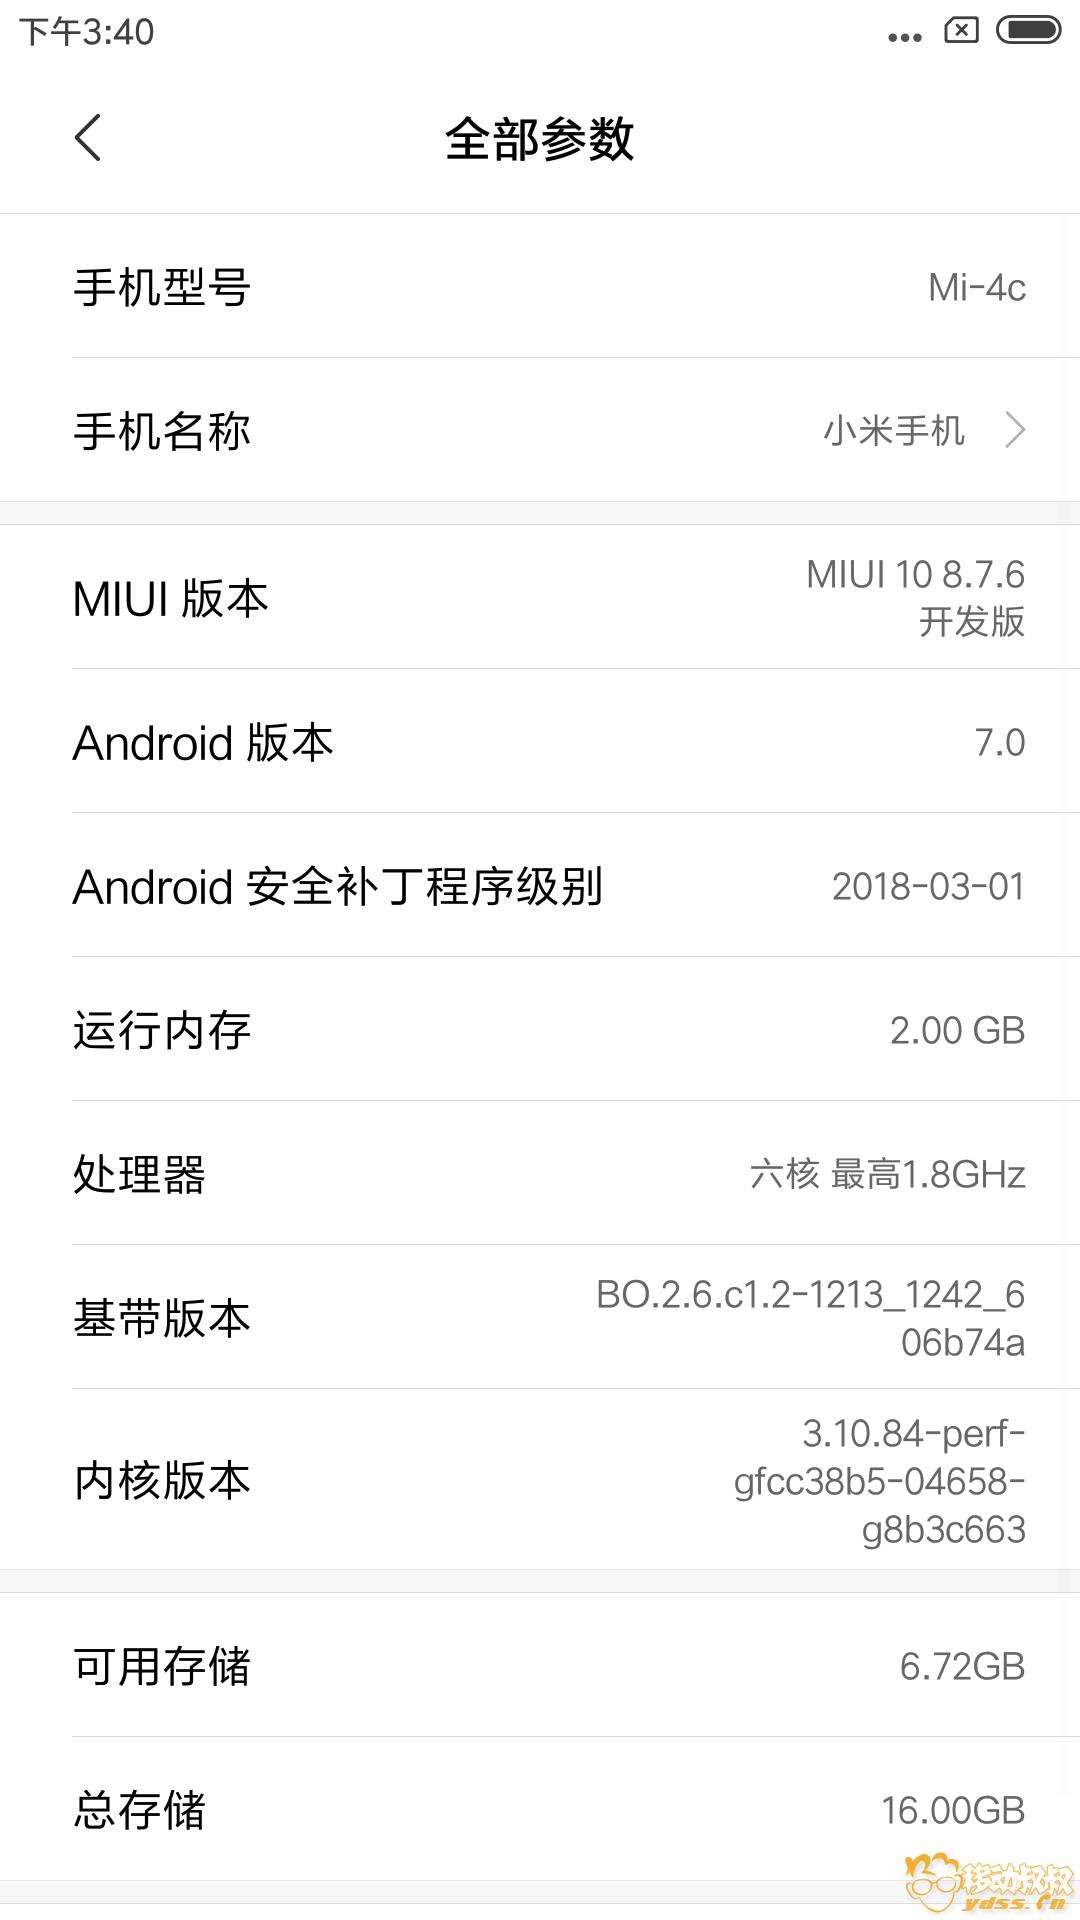 Screenshot_2018-07-06-15-40-40-486_com.android.settings.png